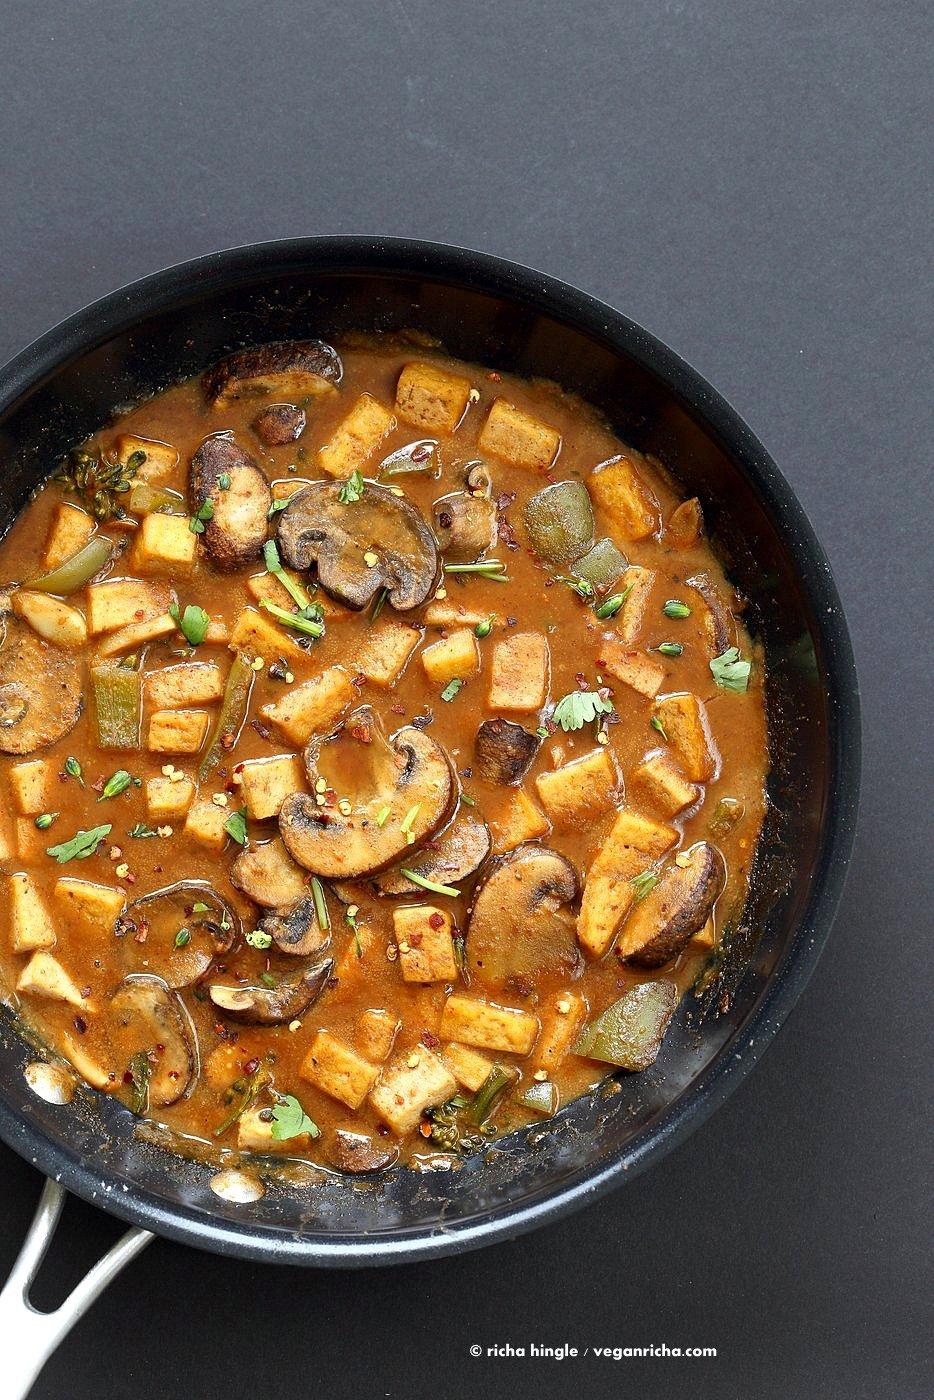 Hoisin Tofu Mushroom Stir Fry with homemade Hoisin Sauce. Easy Weeknight Meal with crisped Tofu, golden mushrooms, broccoli, peppers in from scratch Hoisin sauce. Serve over cooked grains. Vegan Gluten-free Recipe.   VeganRicha.com